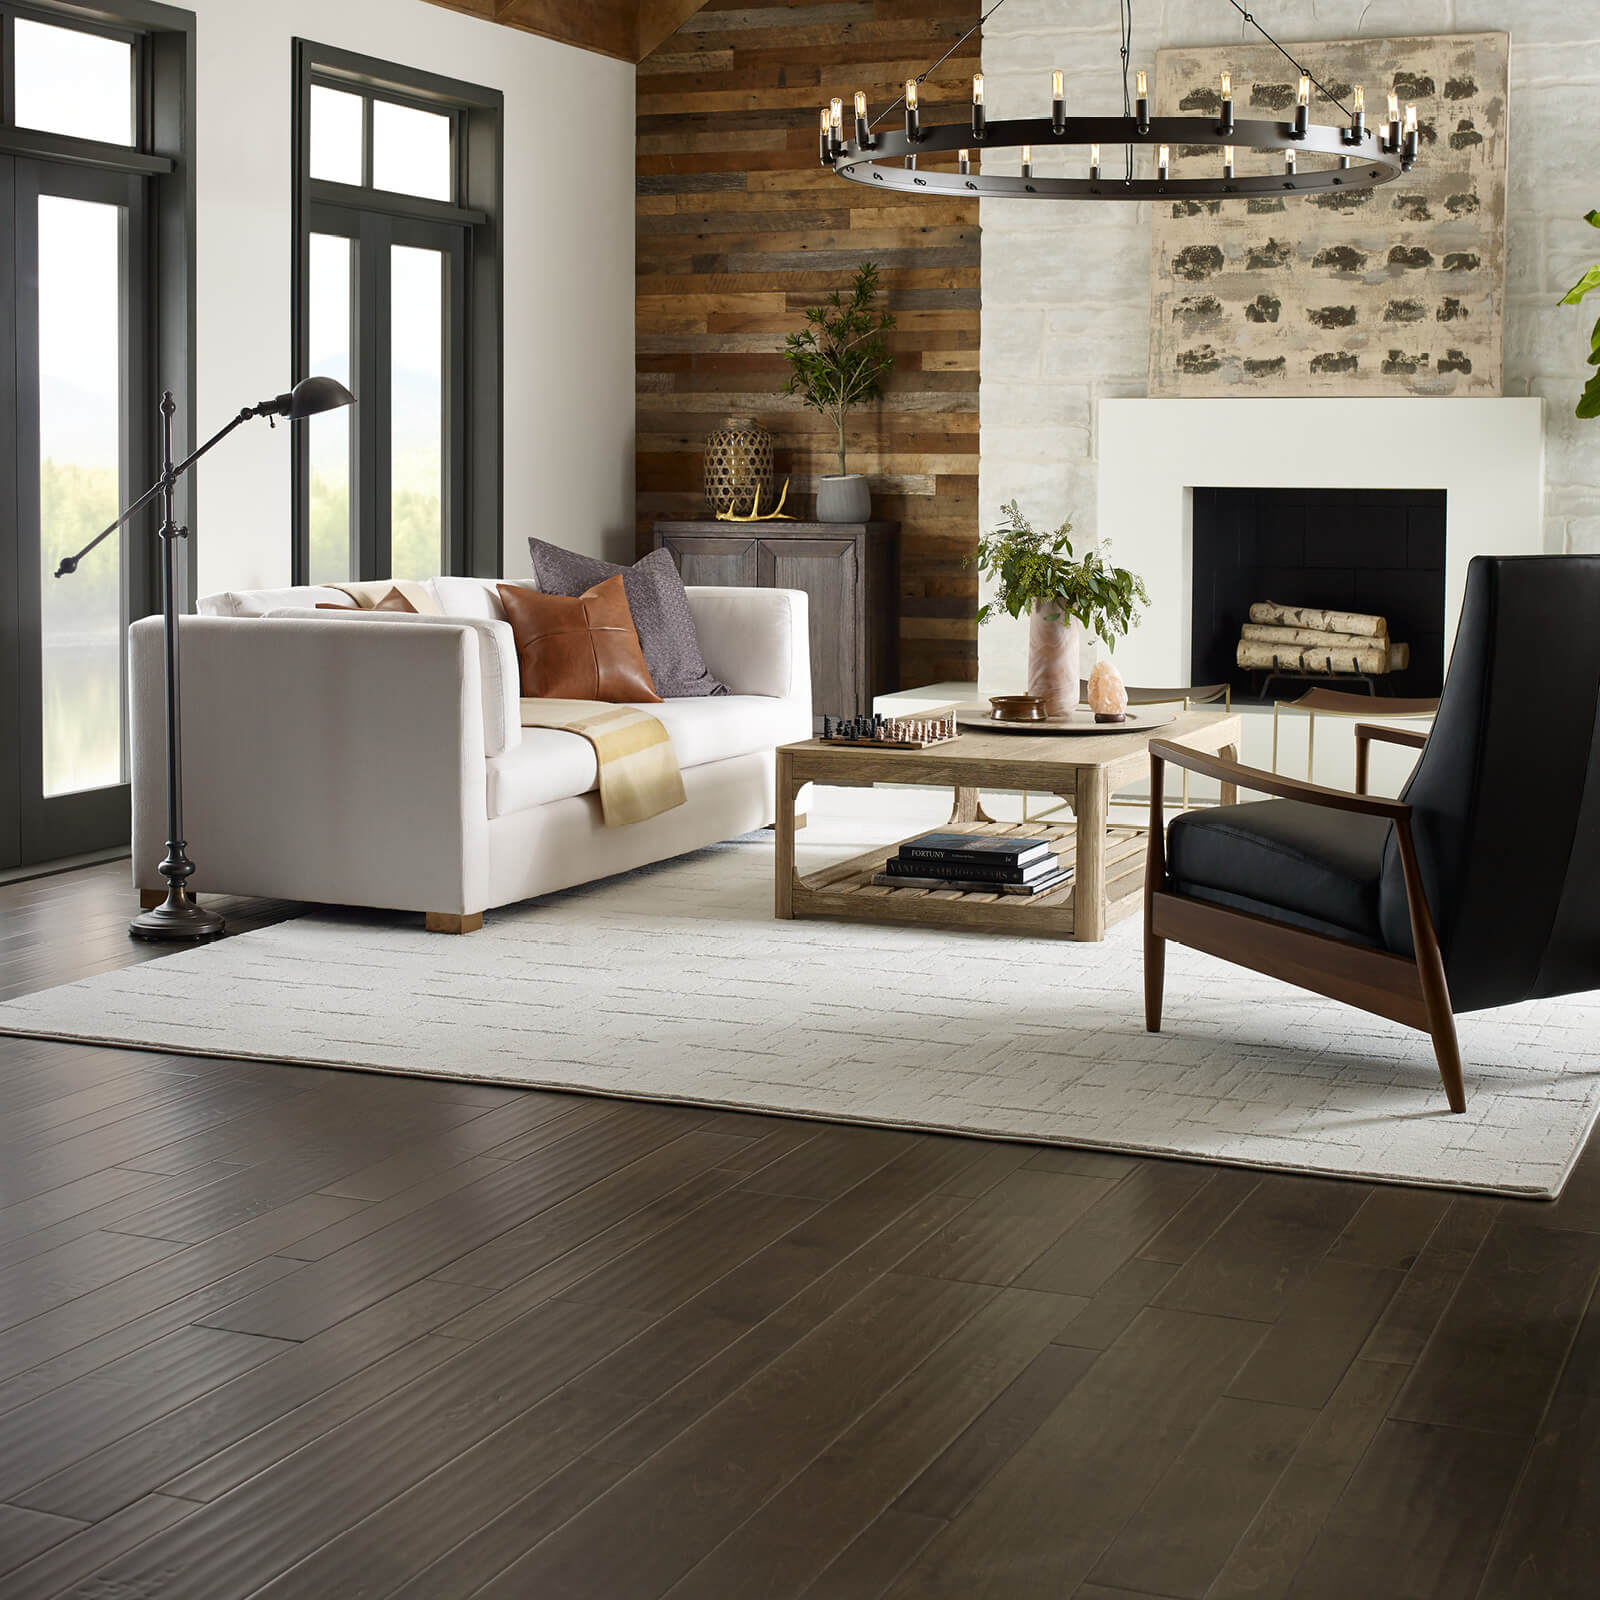 Key West hardwood Flooring   Elite Builder Services